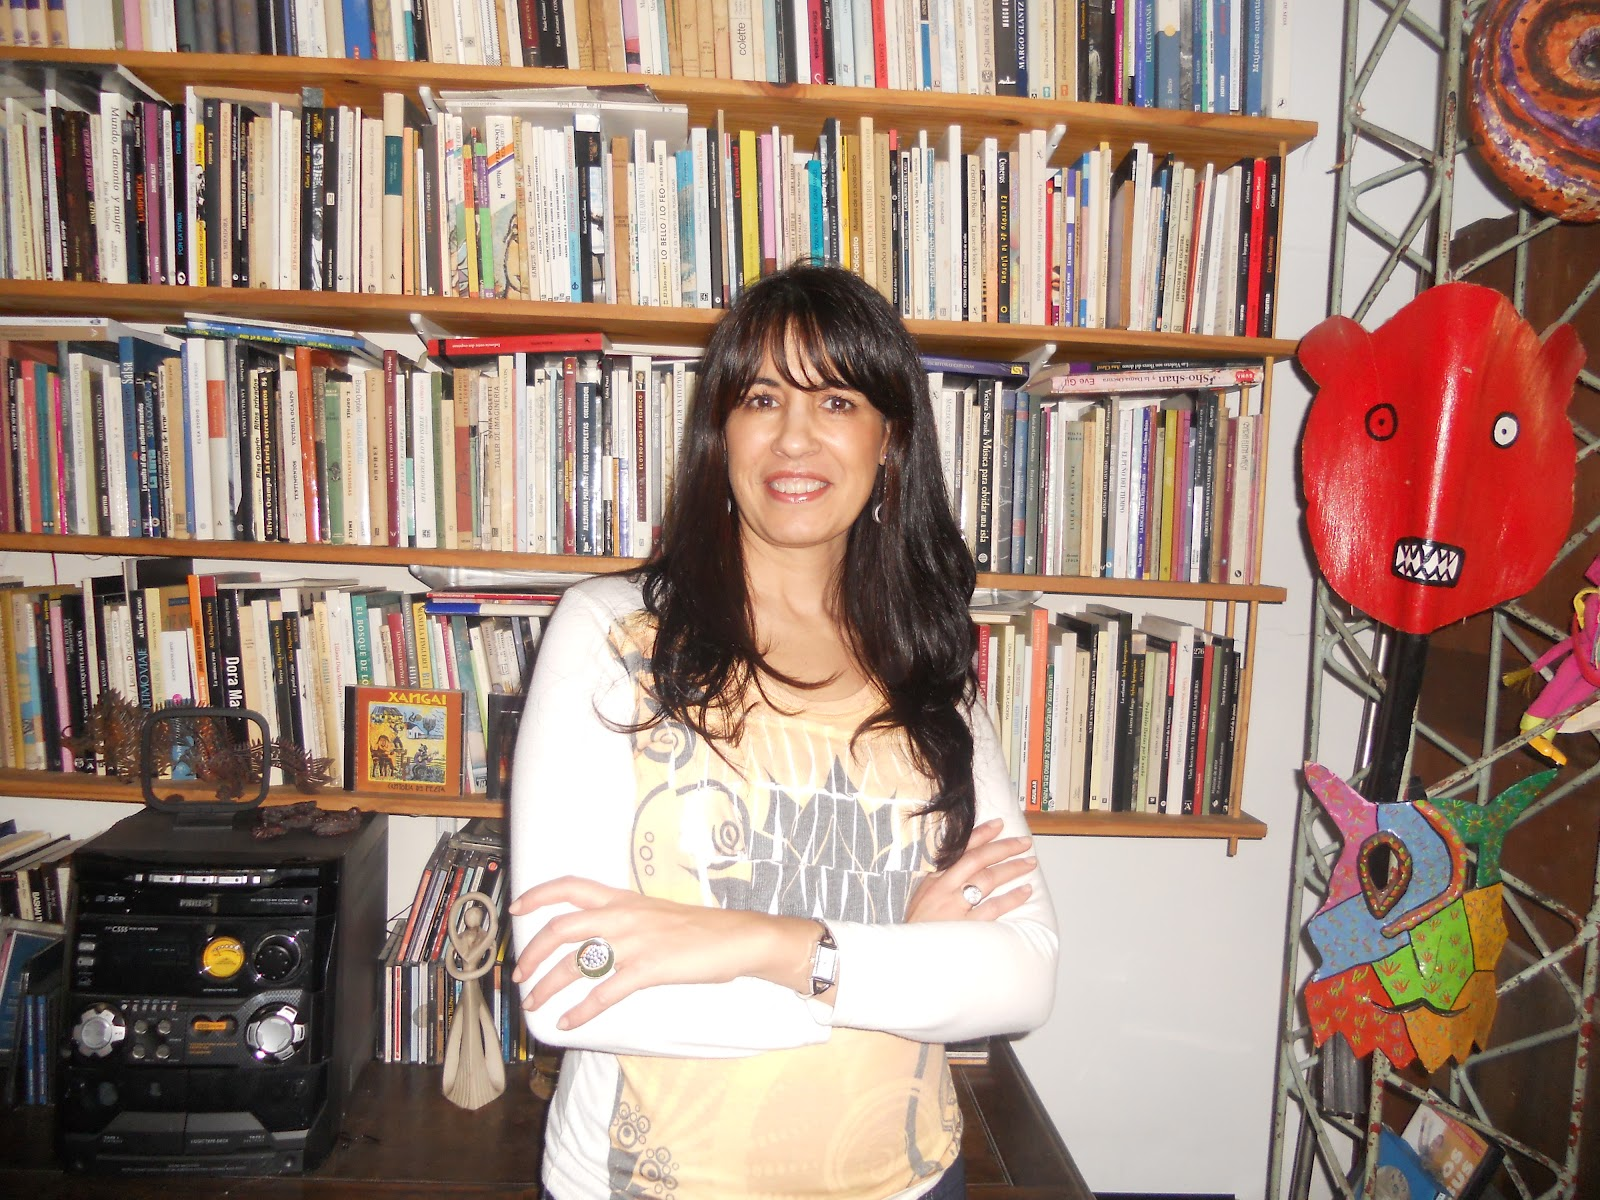 Internacional Microcuentista -: Breve entrevista a Sandra Bianchi